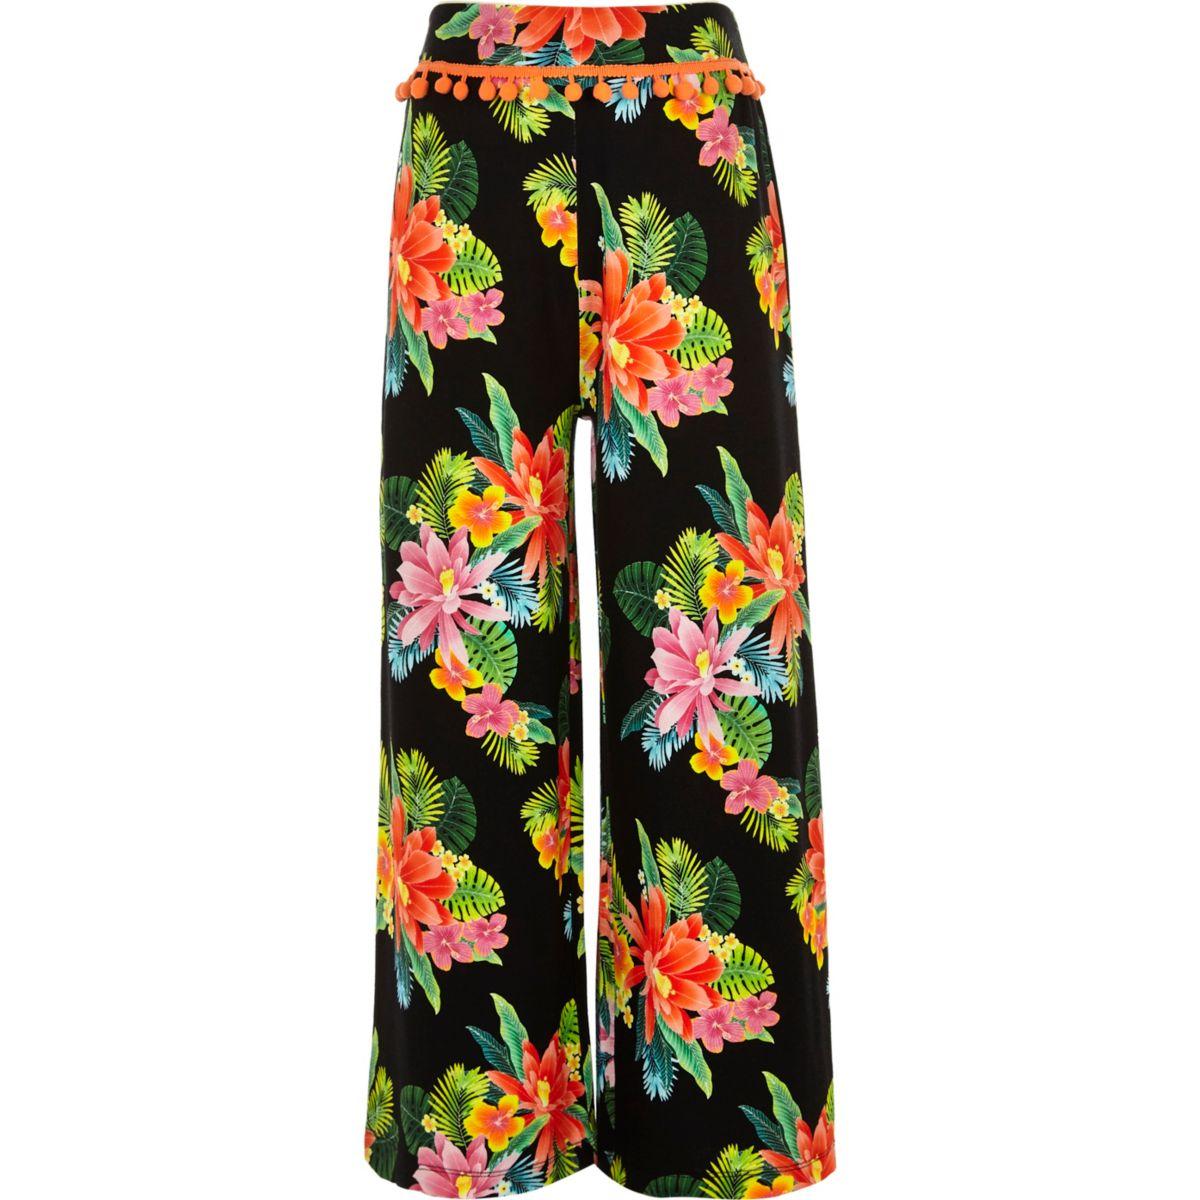 Girls black wide leg floral print trousers